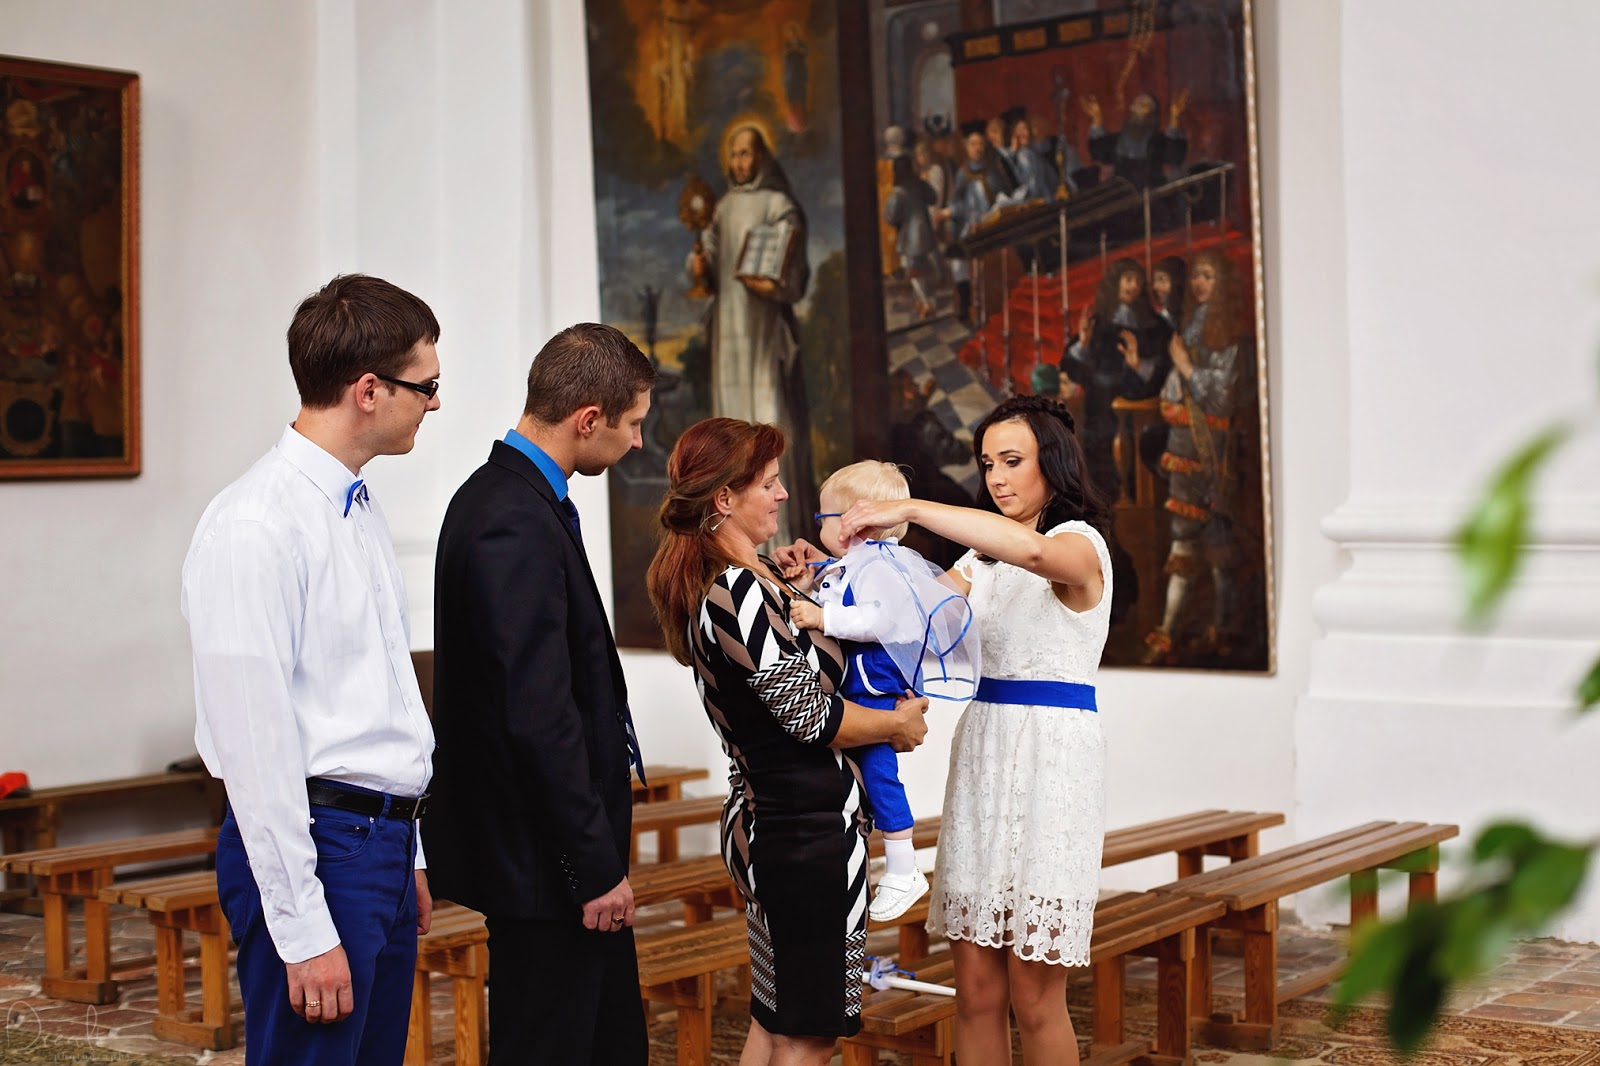 Krikštynų ceremonija